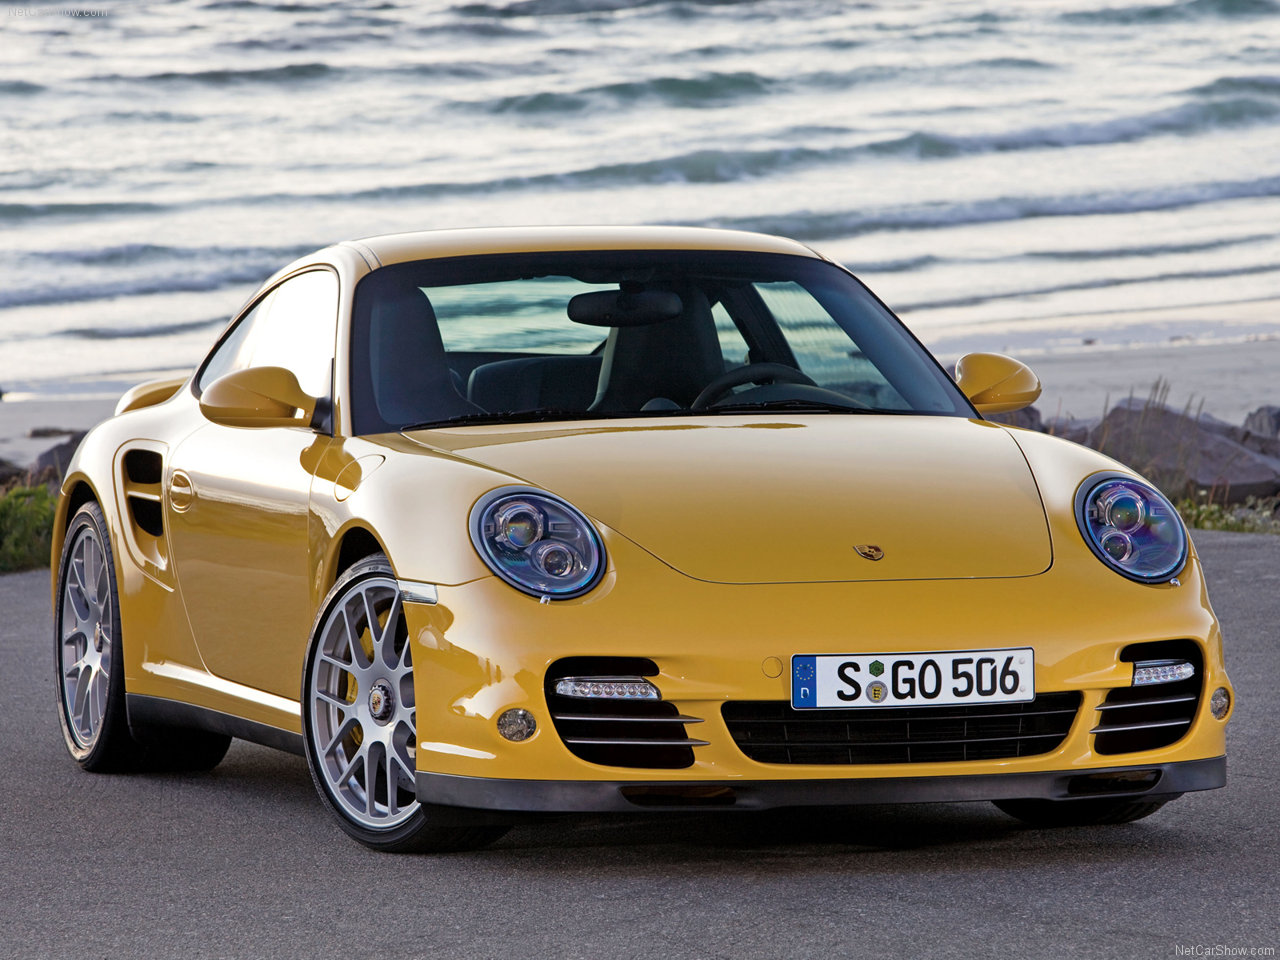 http://4.bp.blogspot.com/_Uo4WUJnySi8/S9J27RM6lCI/AAAAAAAAADc/D4PR_41S-NI/s1600/Porsche-911_Turbo_2010_1280x960_wallpaper_01.jpg